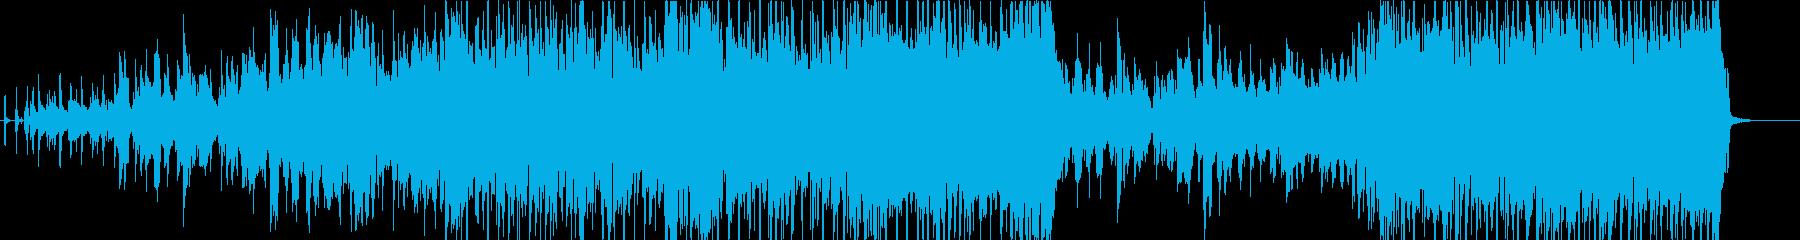 ill communicationの再生済みの波形